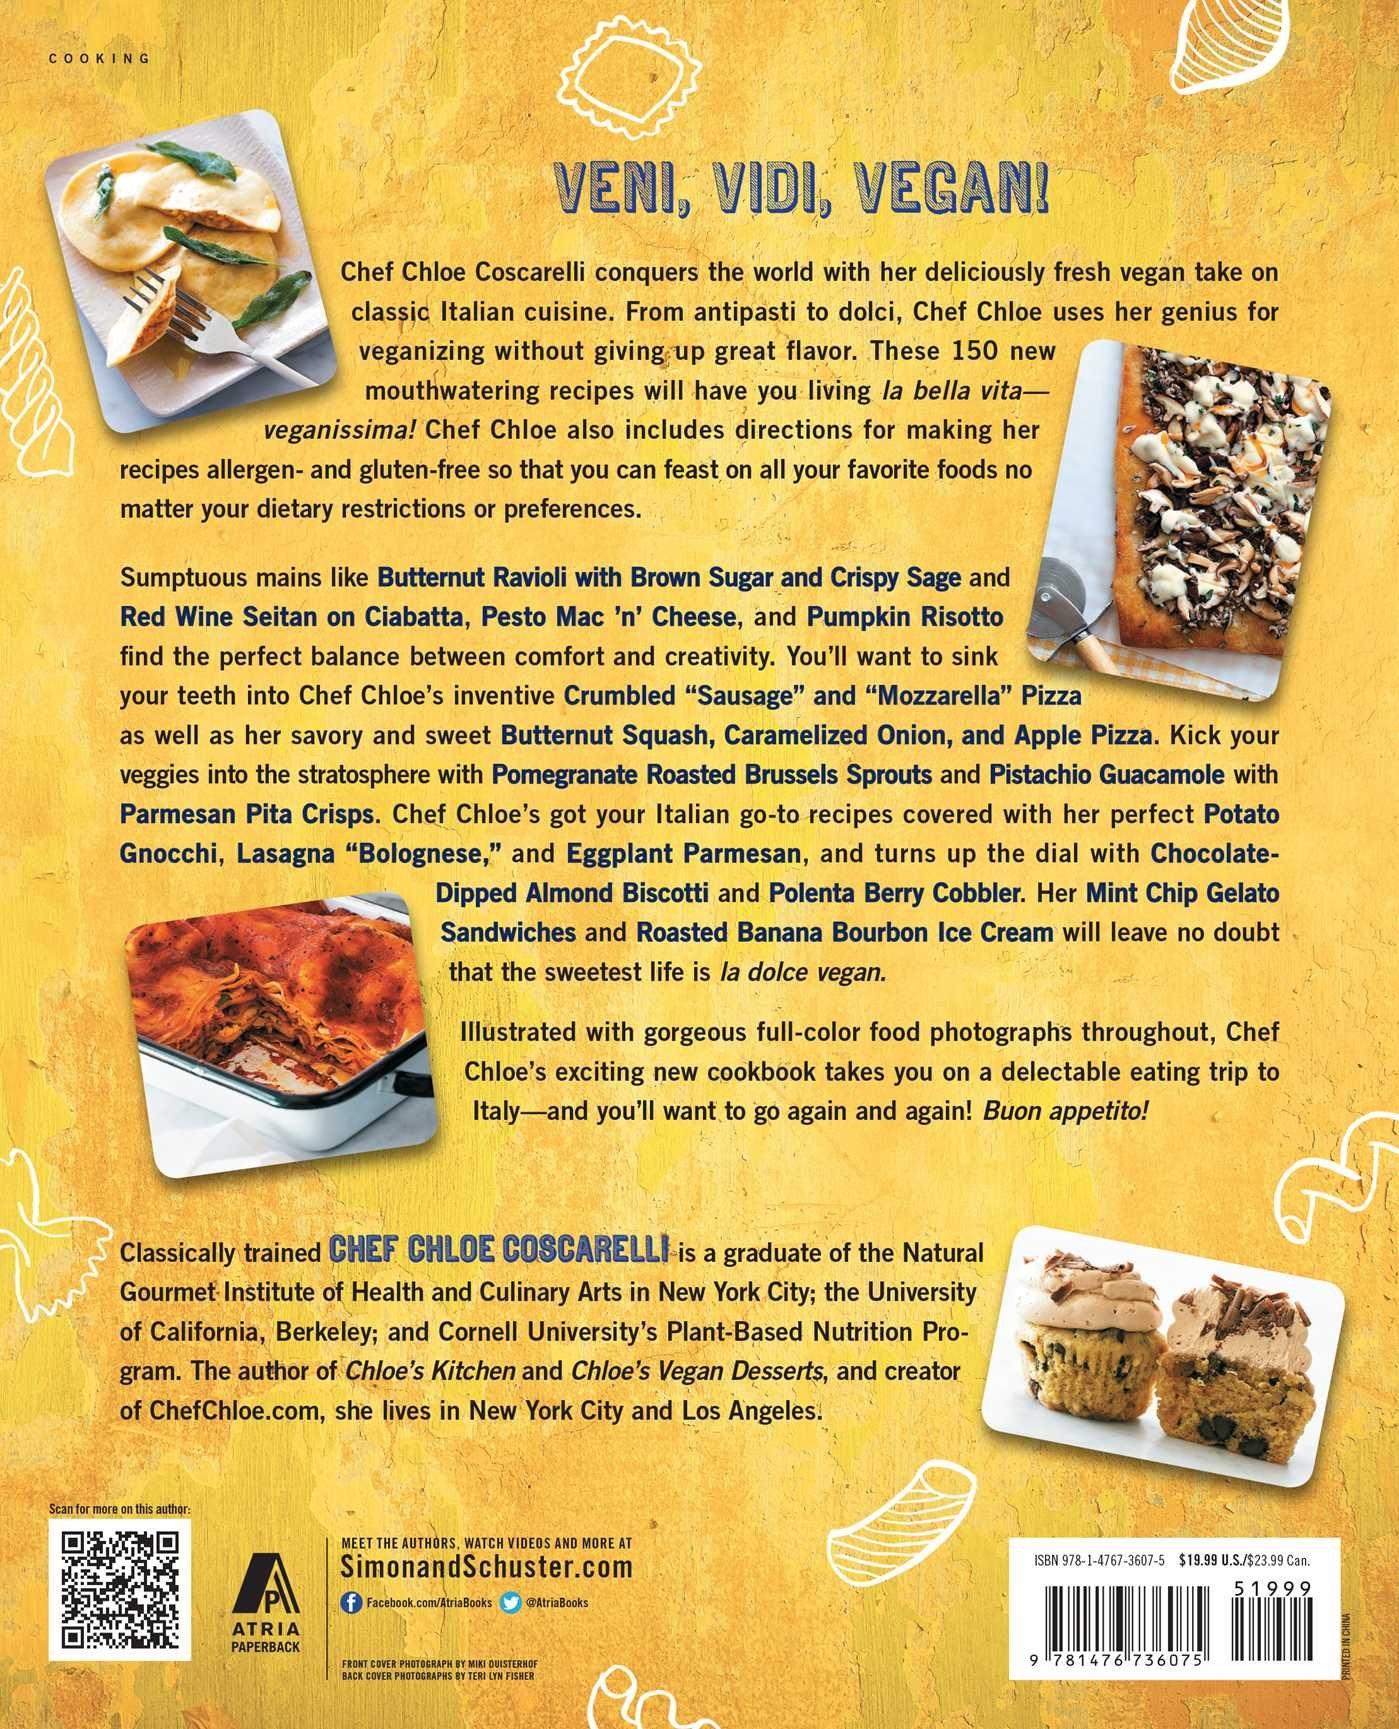 Chloe's Vegan Italian Kitchen: 150 Pizzas, Pastas, Pestos, Risottos, & Lots of Creamy Italian Classics by Atria Books